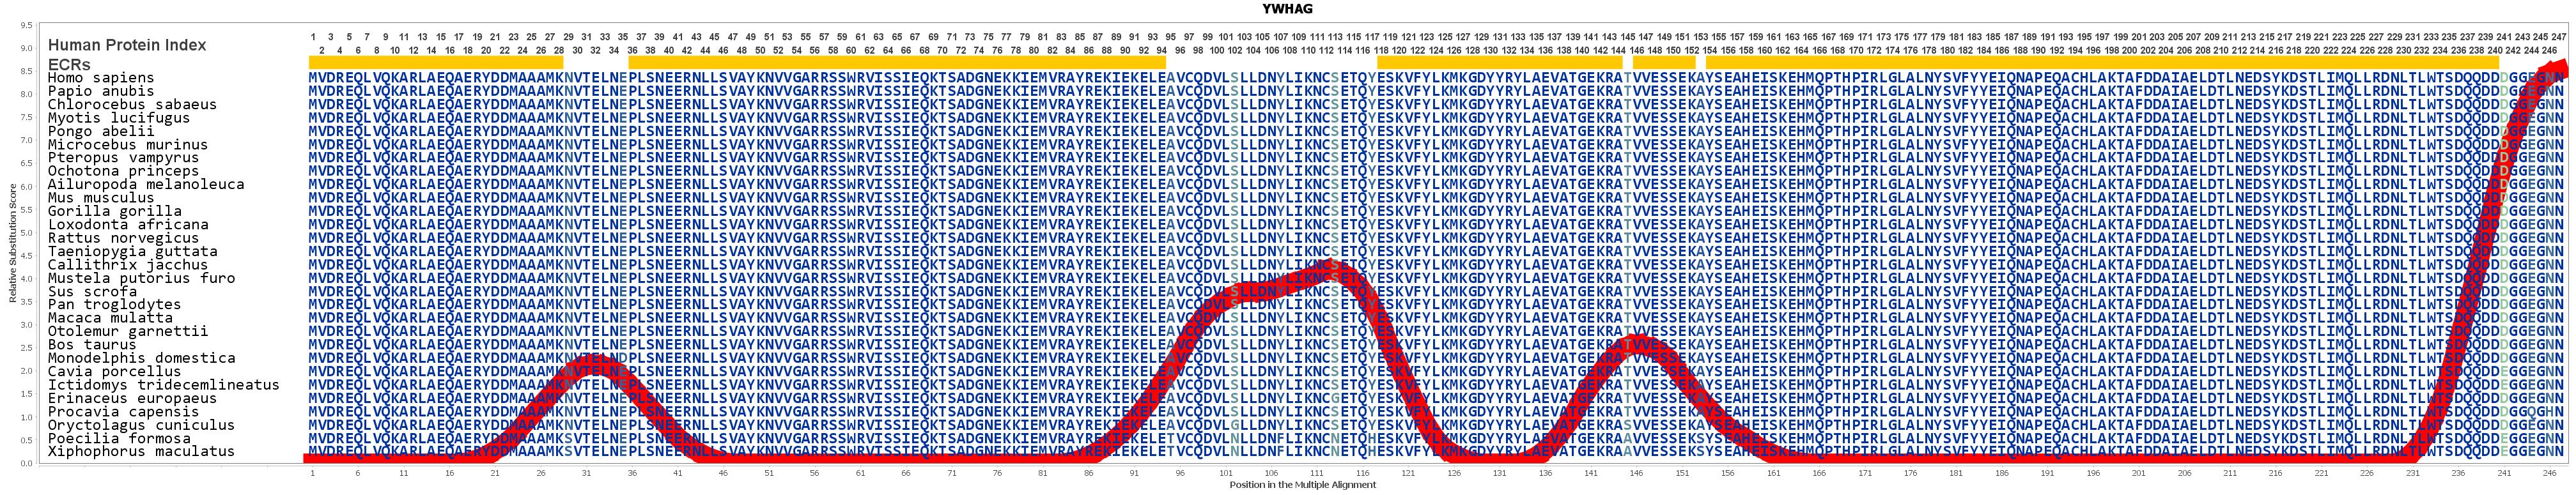 YWHAG Gene GeneCards 1433G Protein